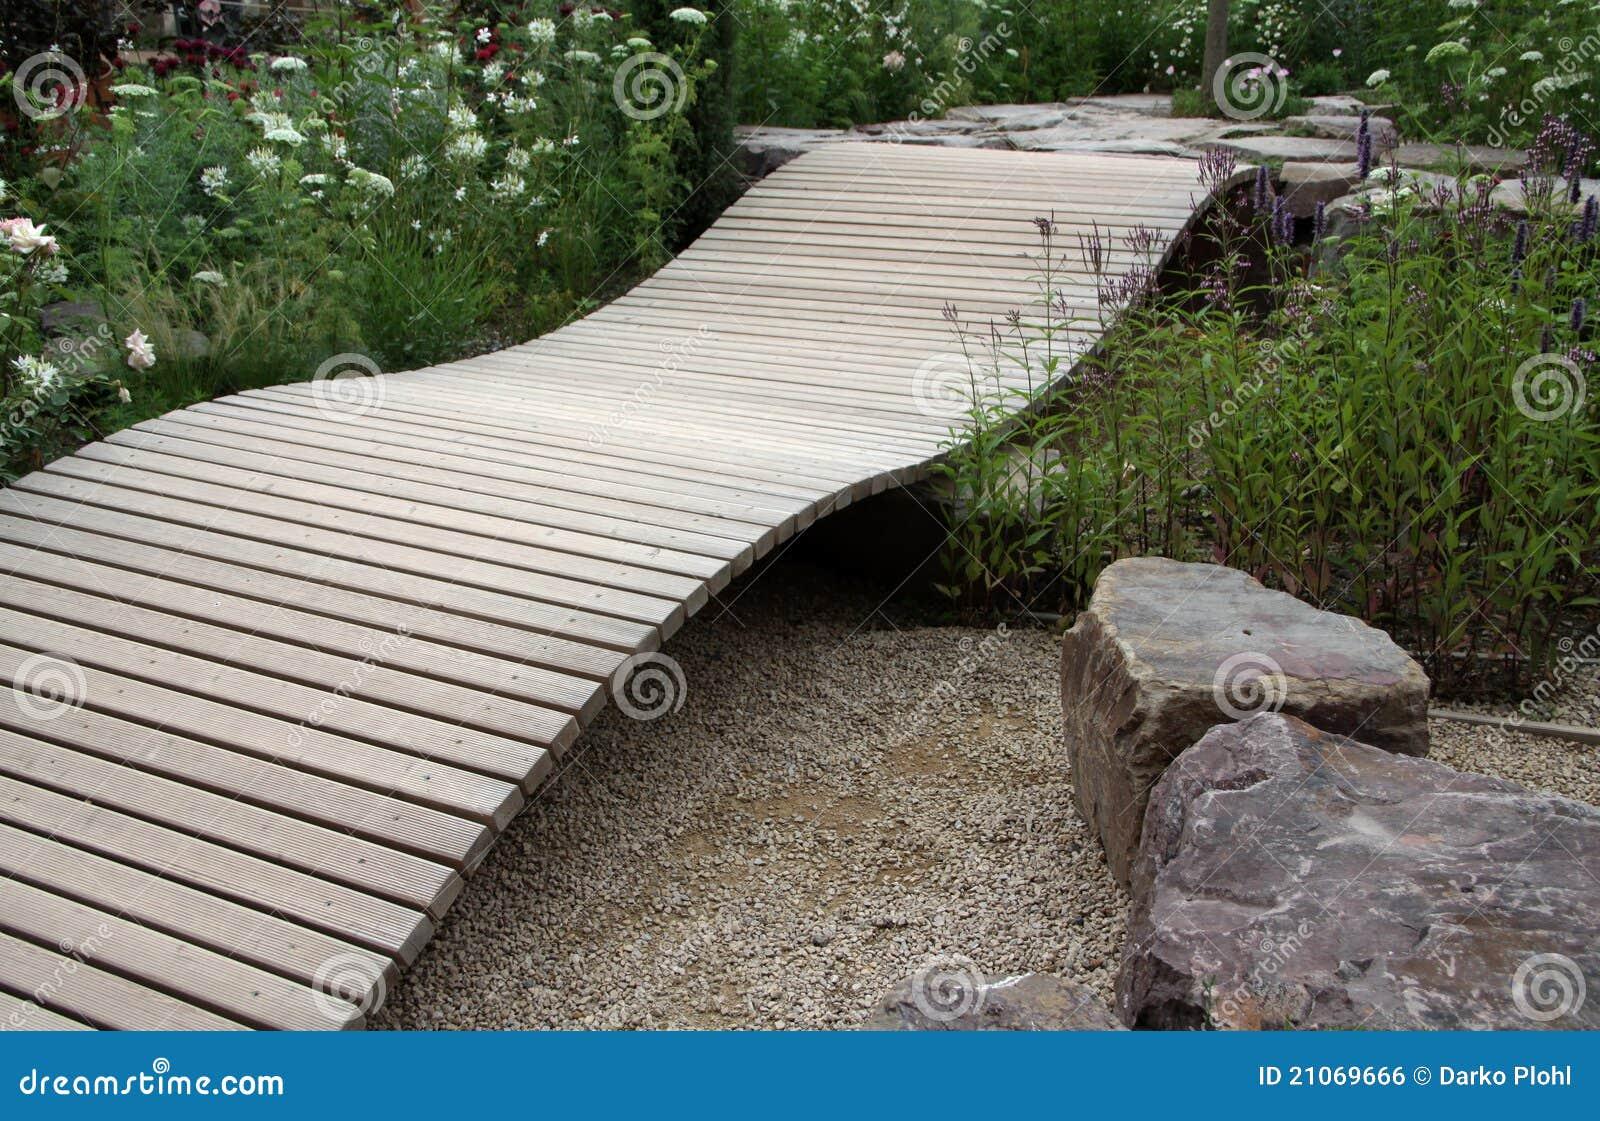 Small Wooden Bridge For Garden